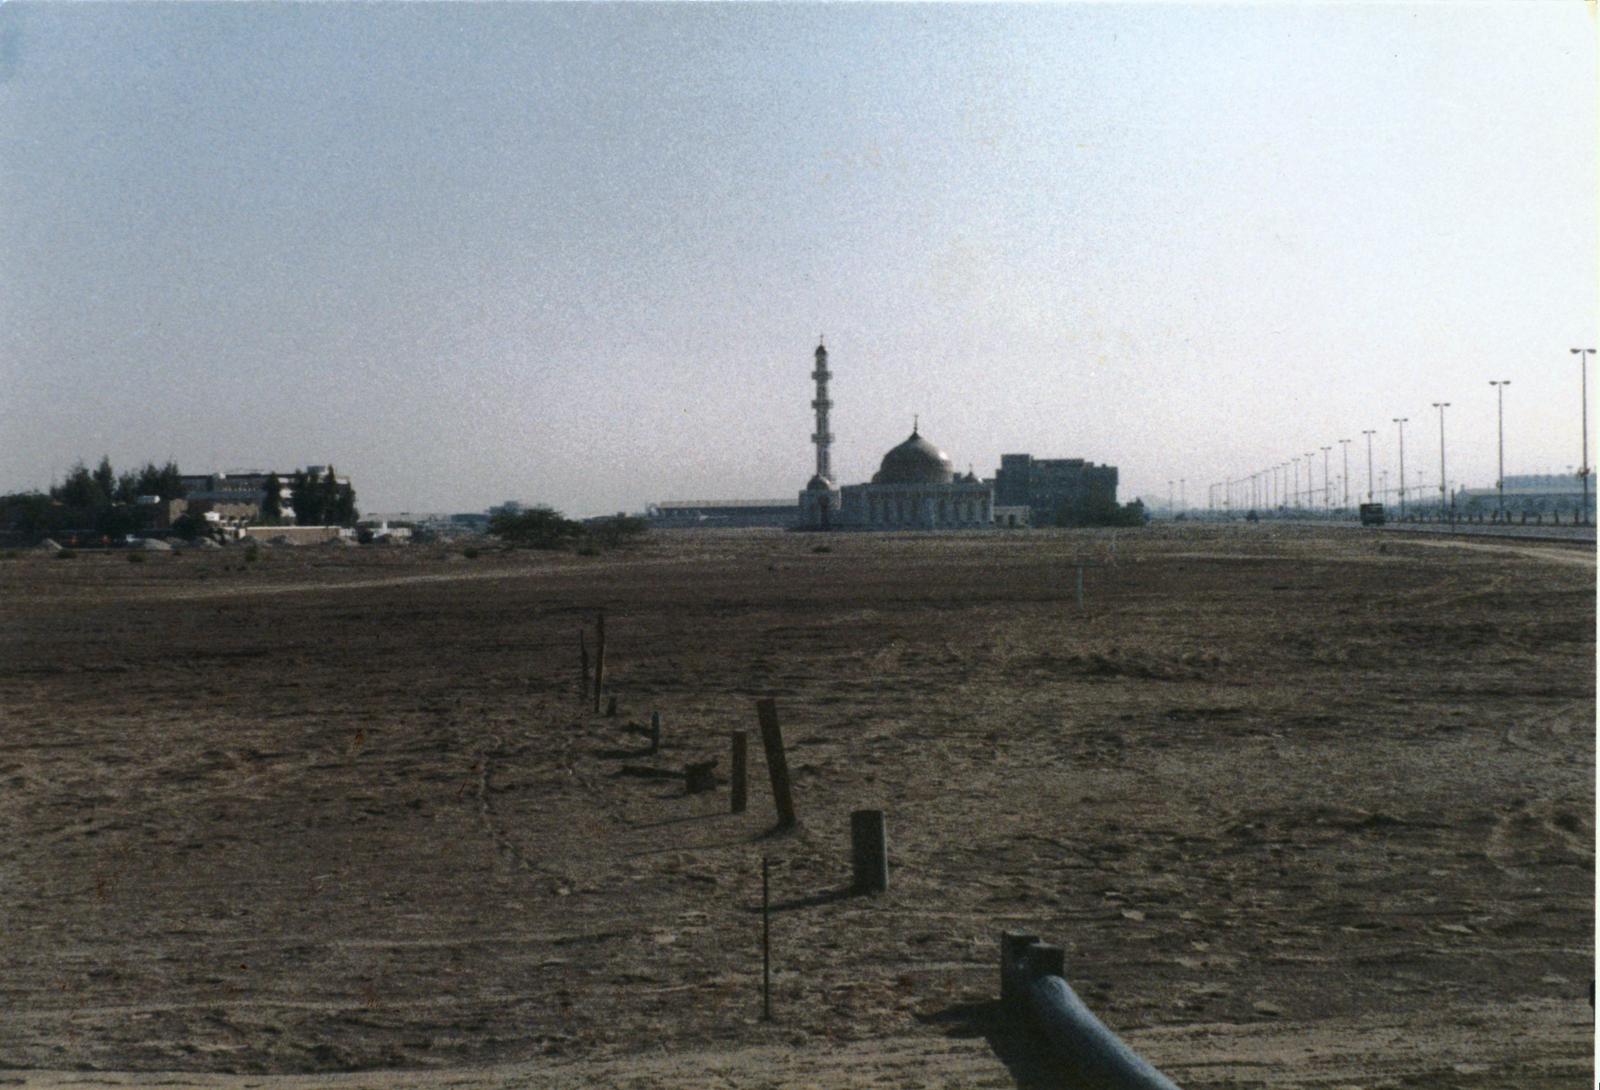 Abu Dhabi - Vacant Site - 1987